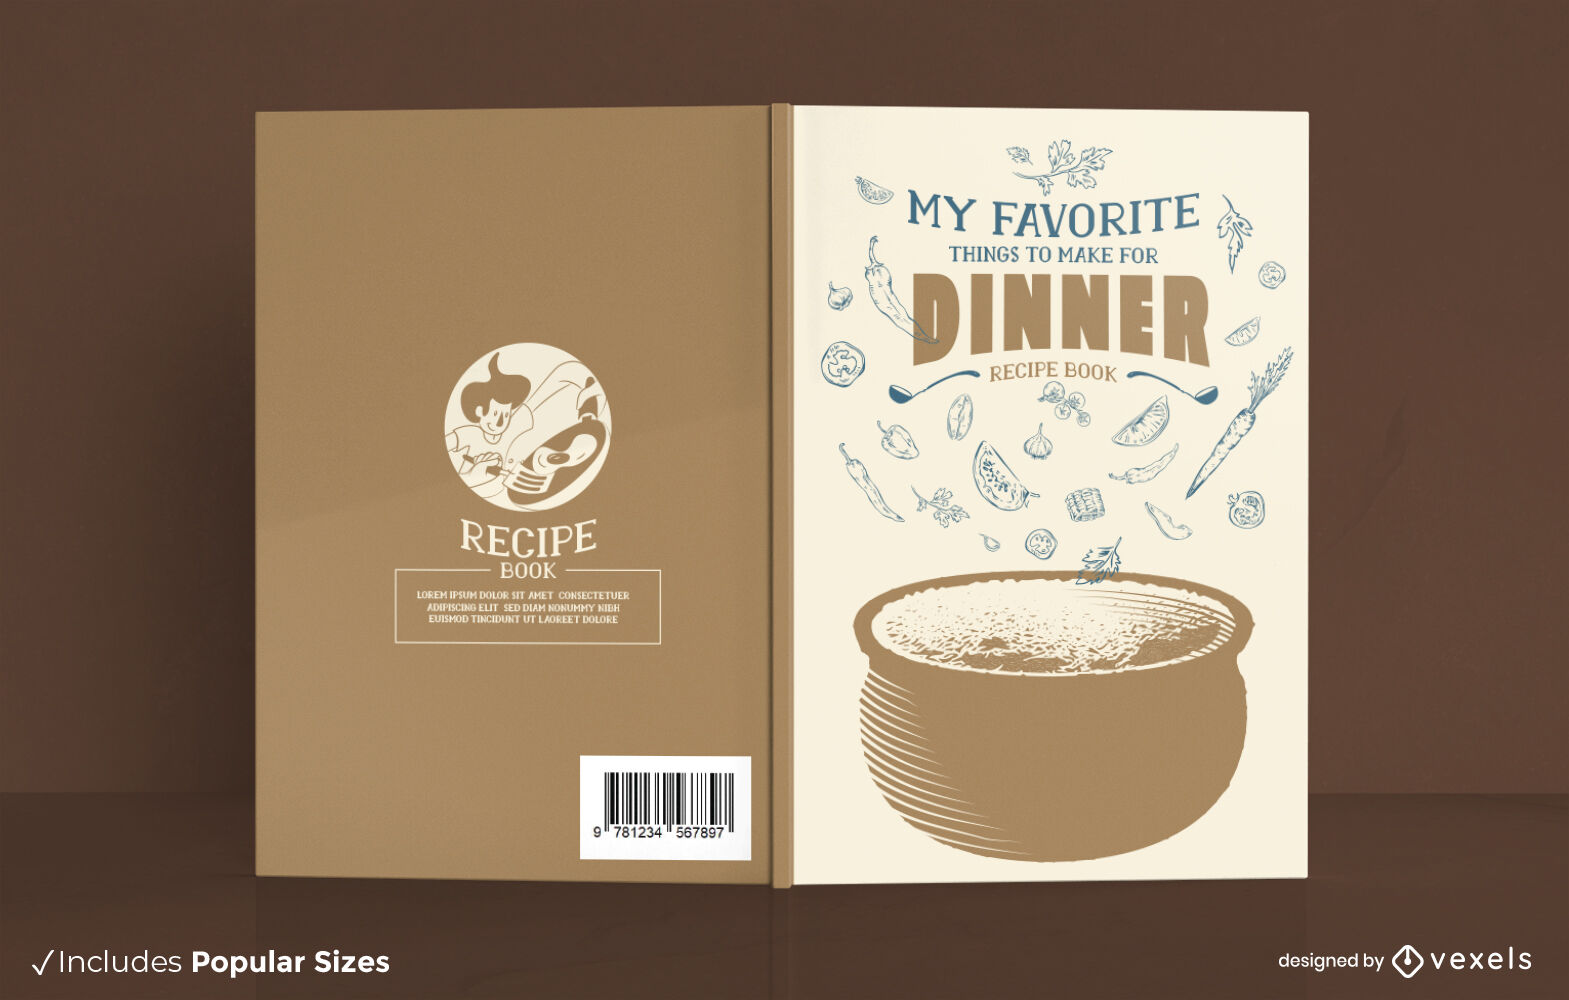 Dinner food recipe book cover design